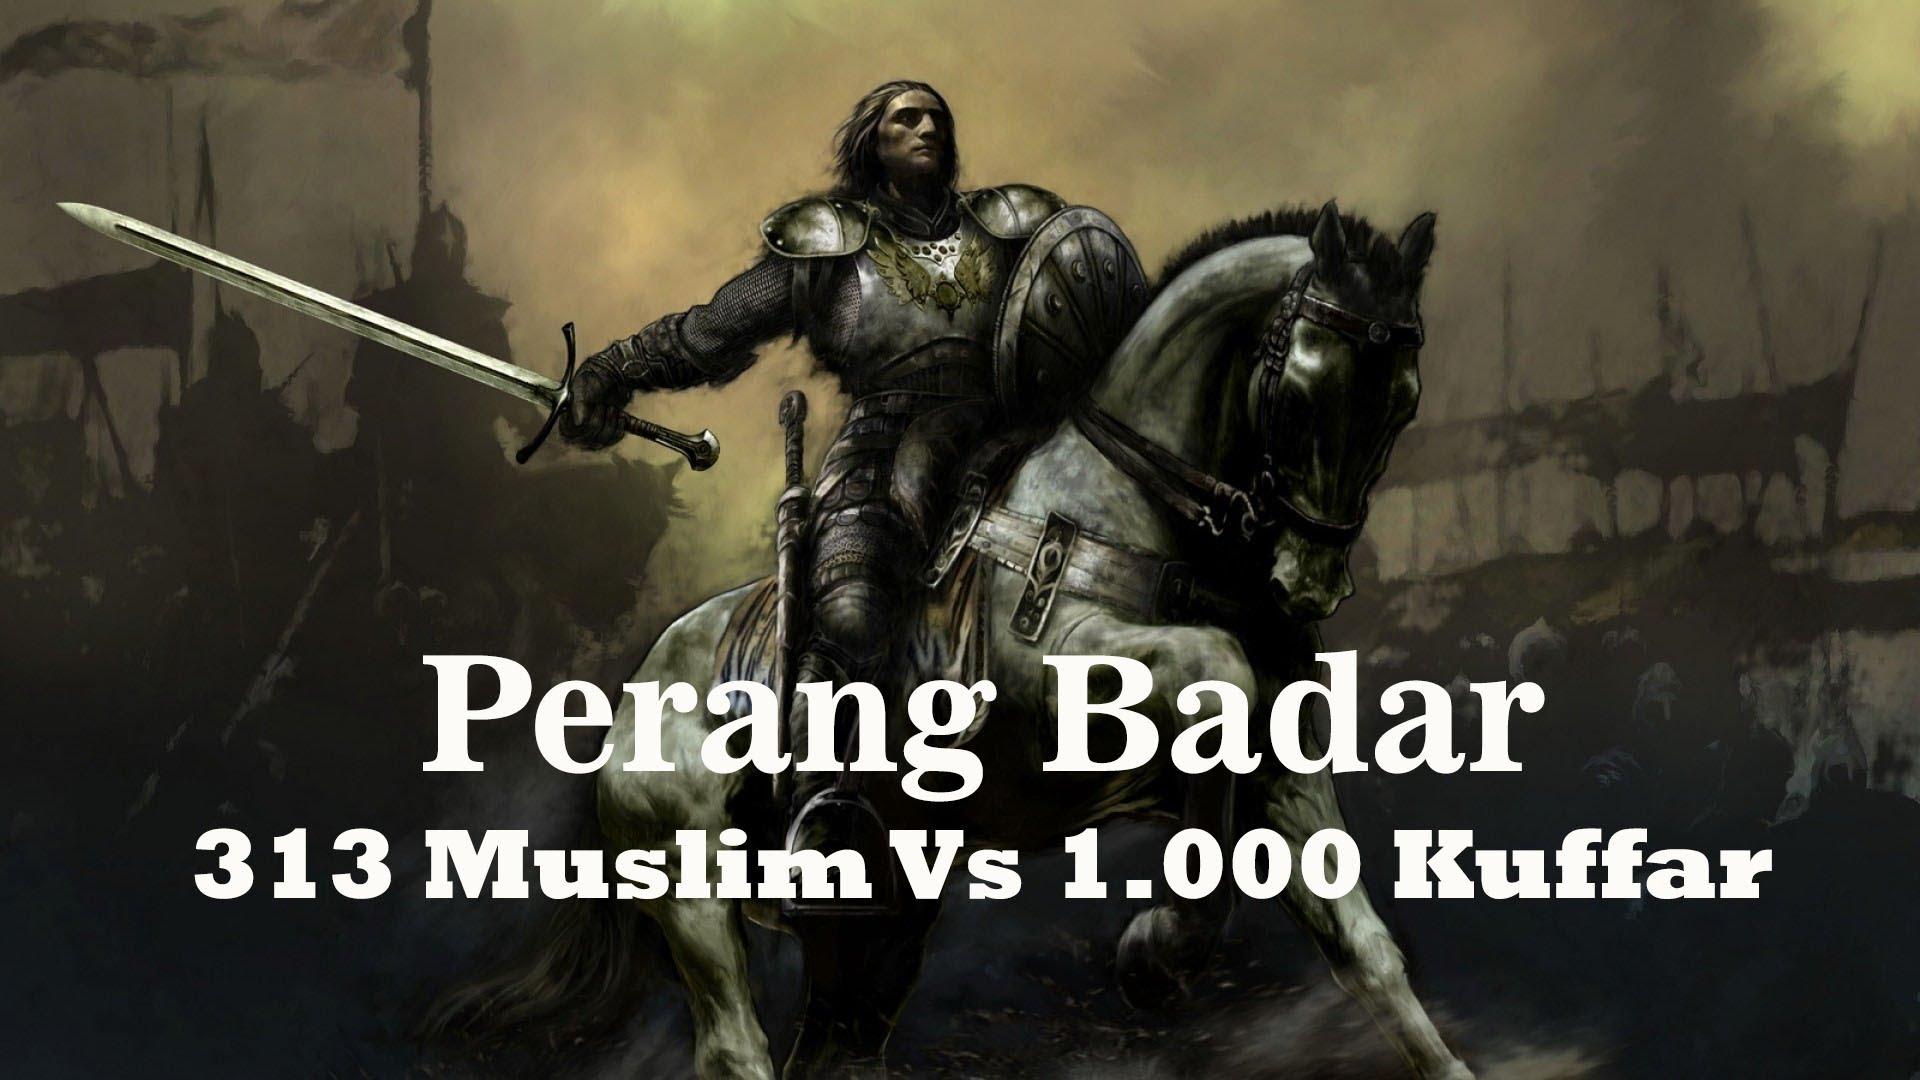 badar war 313